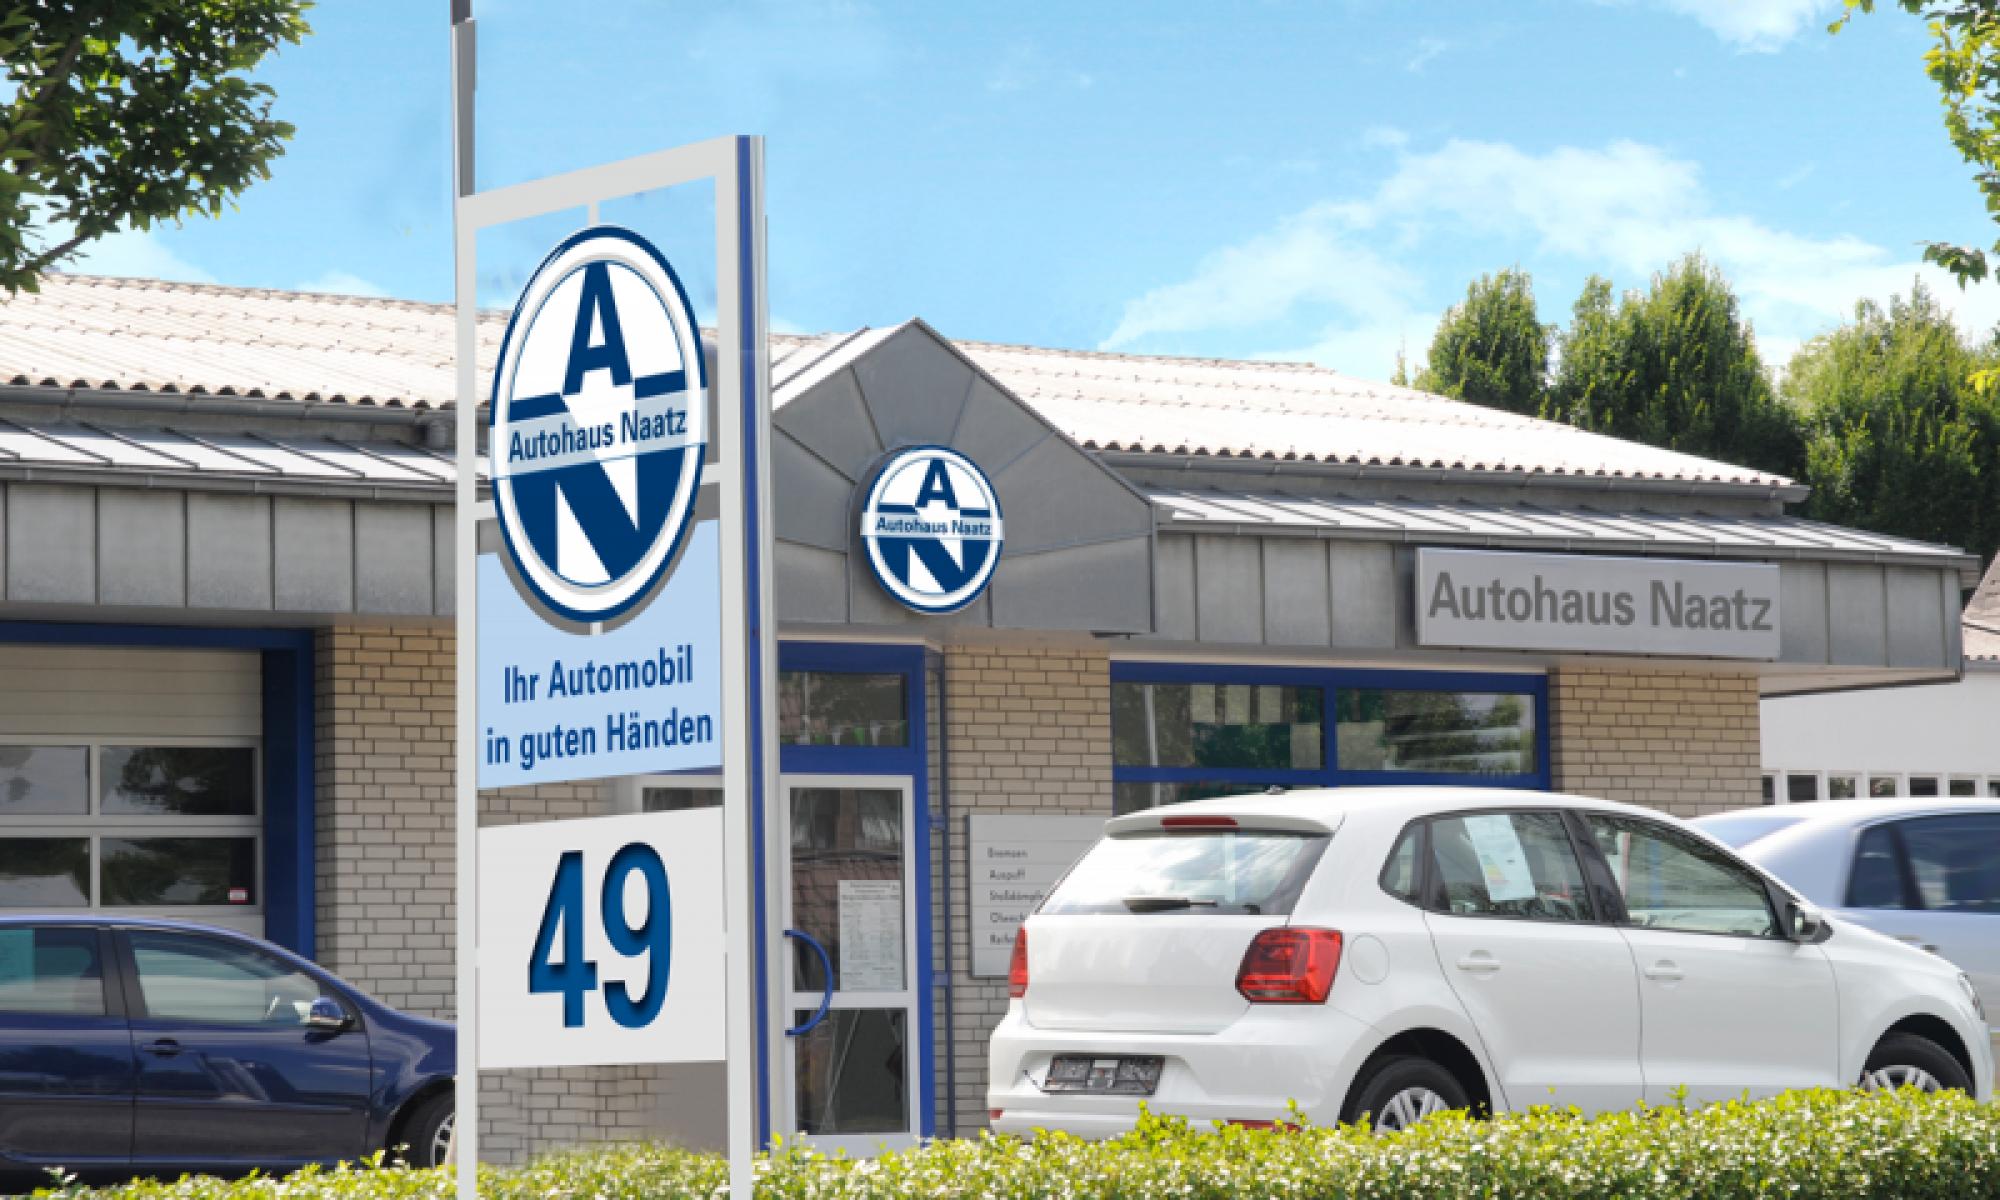 Autohaus Naatz